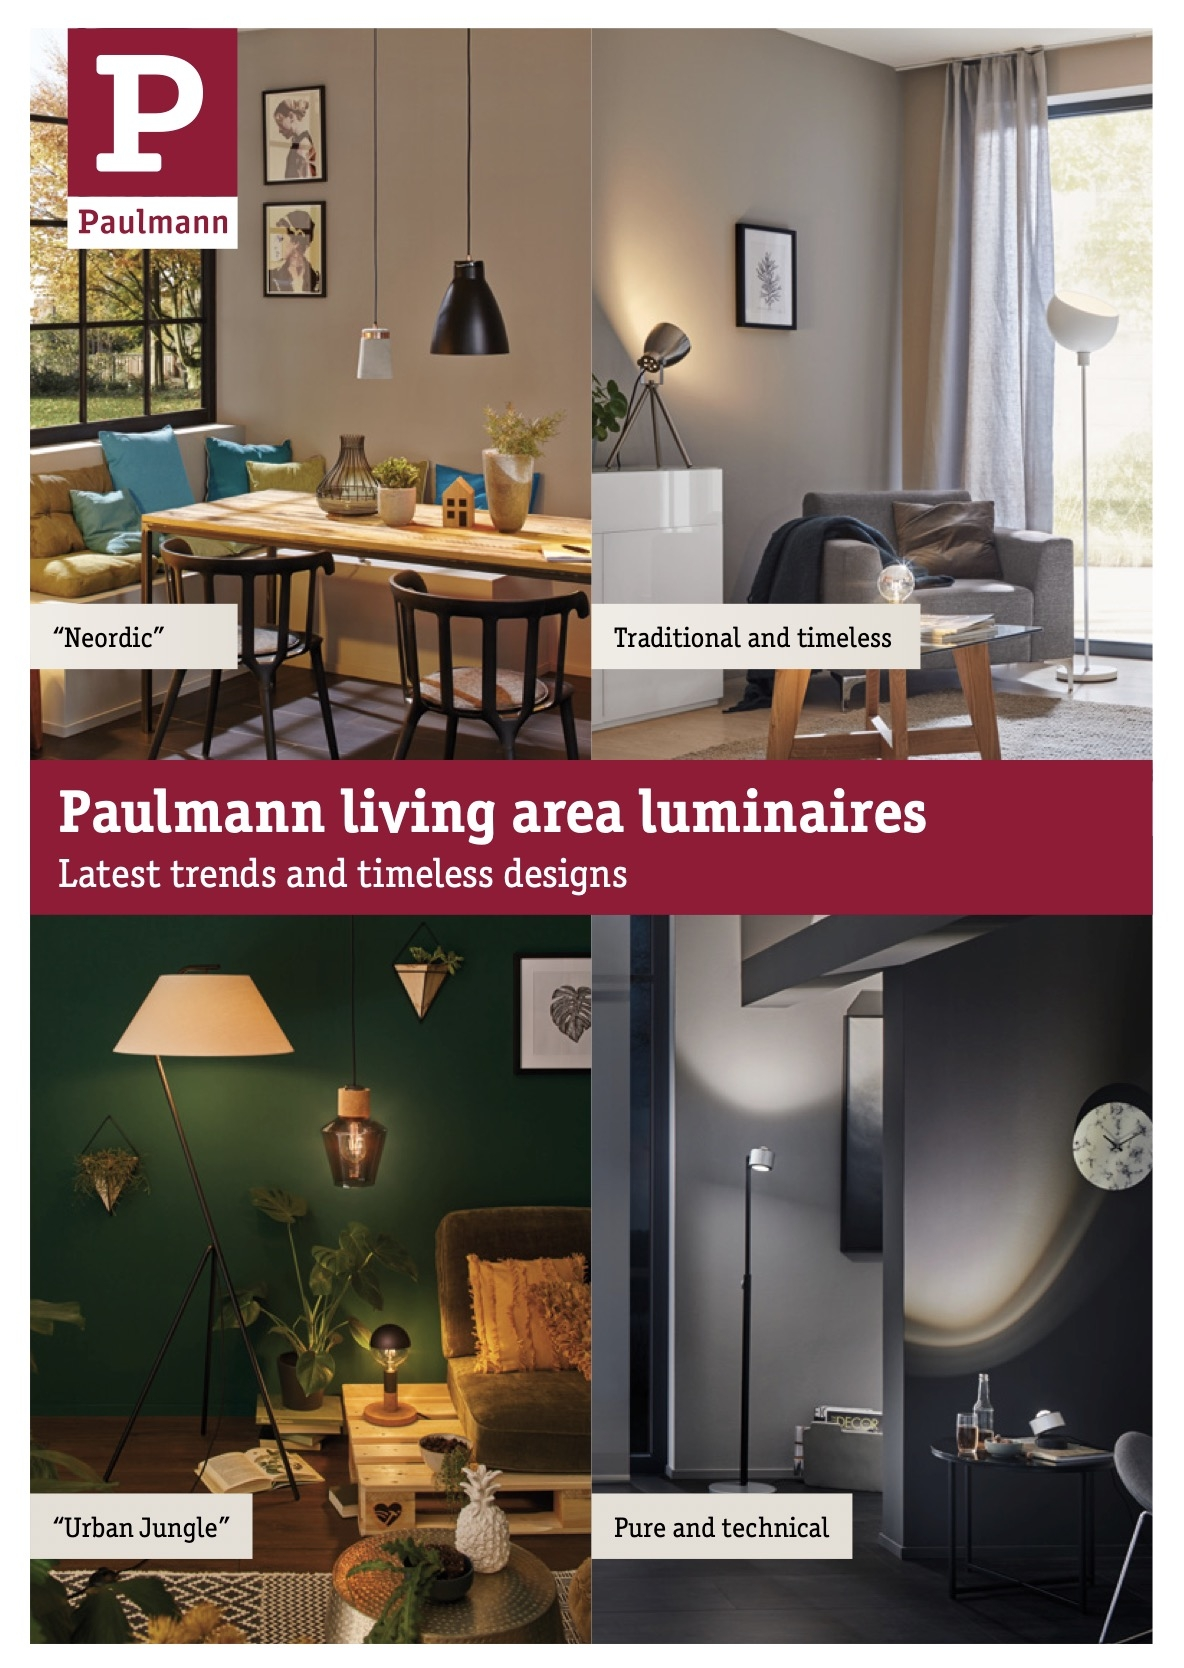 Paulmann living area luminaires